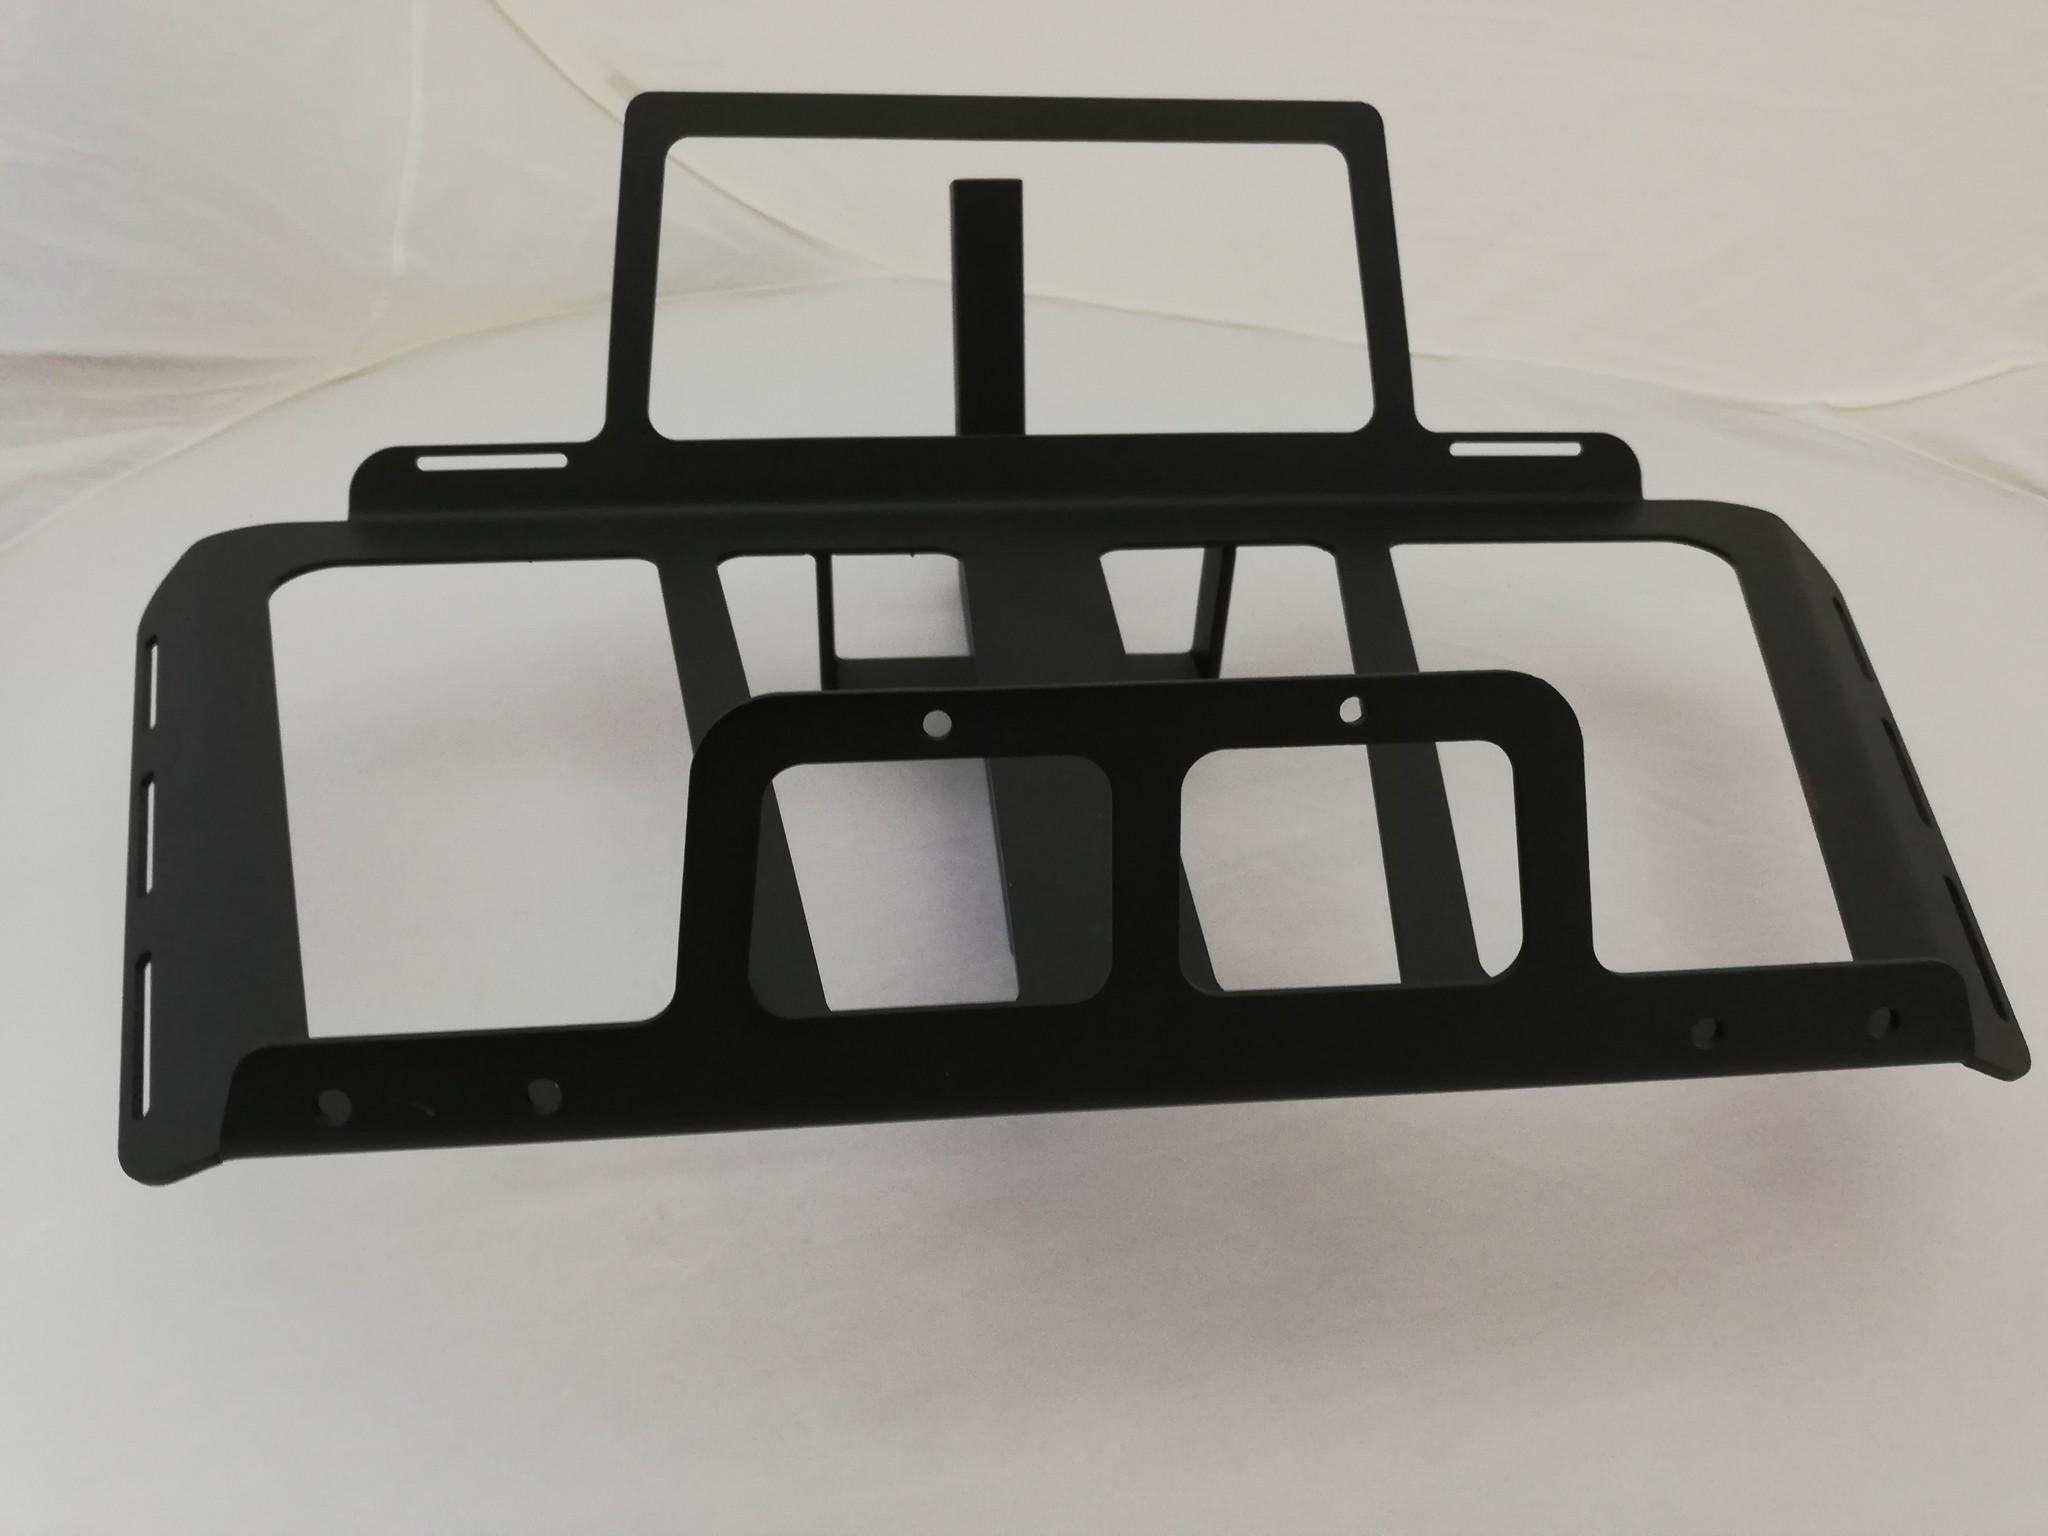 JVR Products Stainless Steel Bottom Mounted Rack GL1800 model 2018 Mat Black